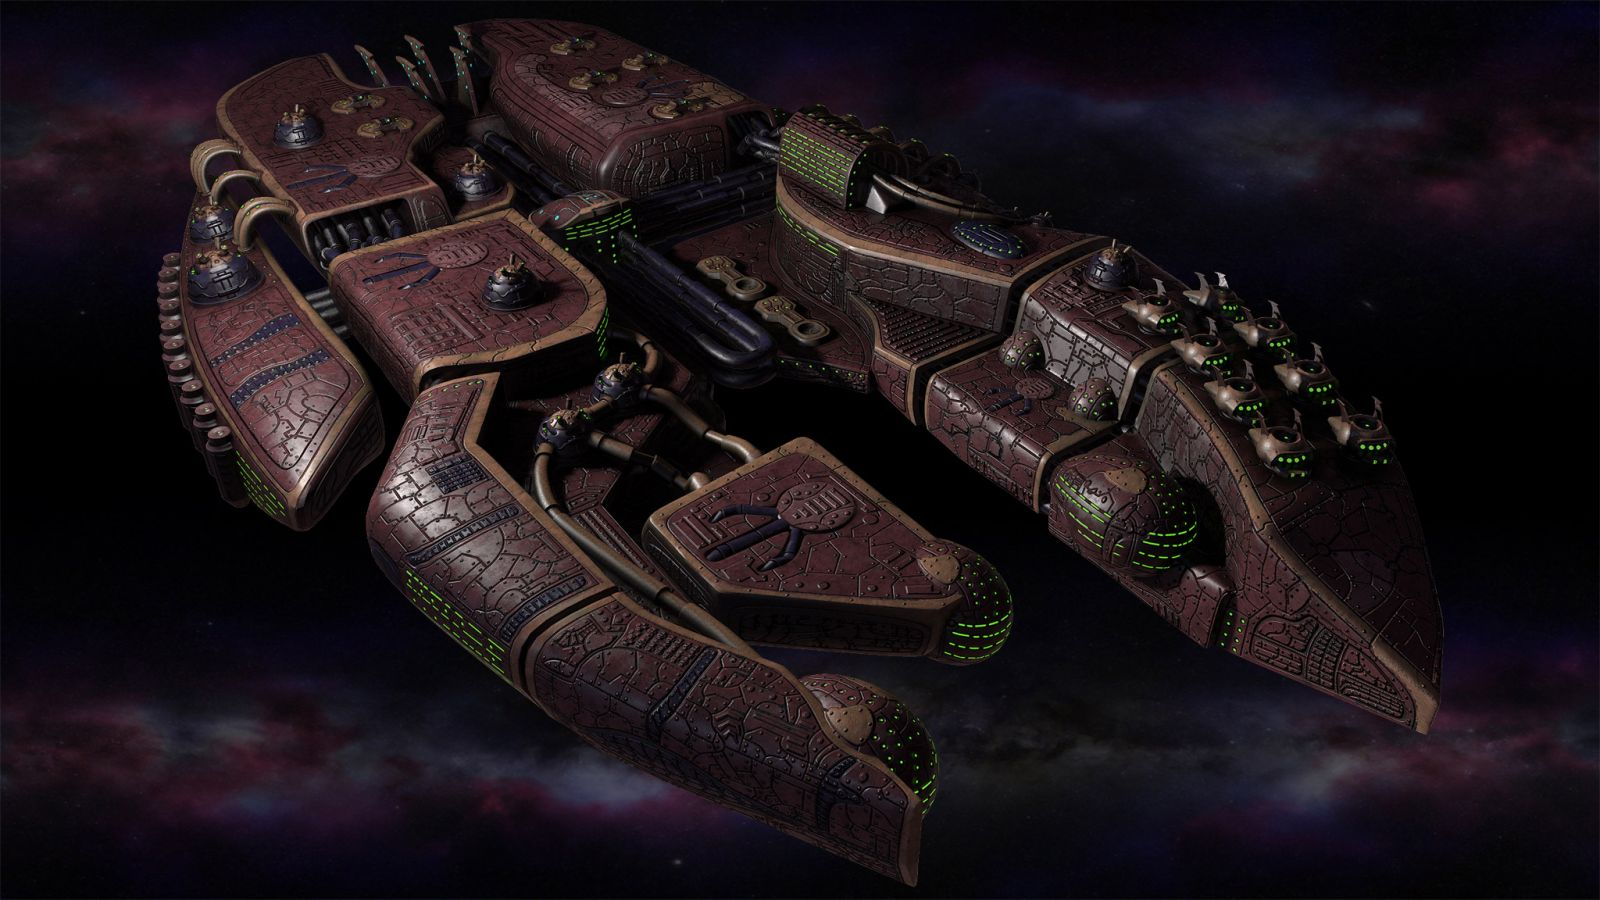 Polaris Sector game. Sharatars race. Dreadnought